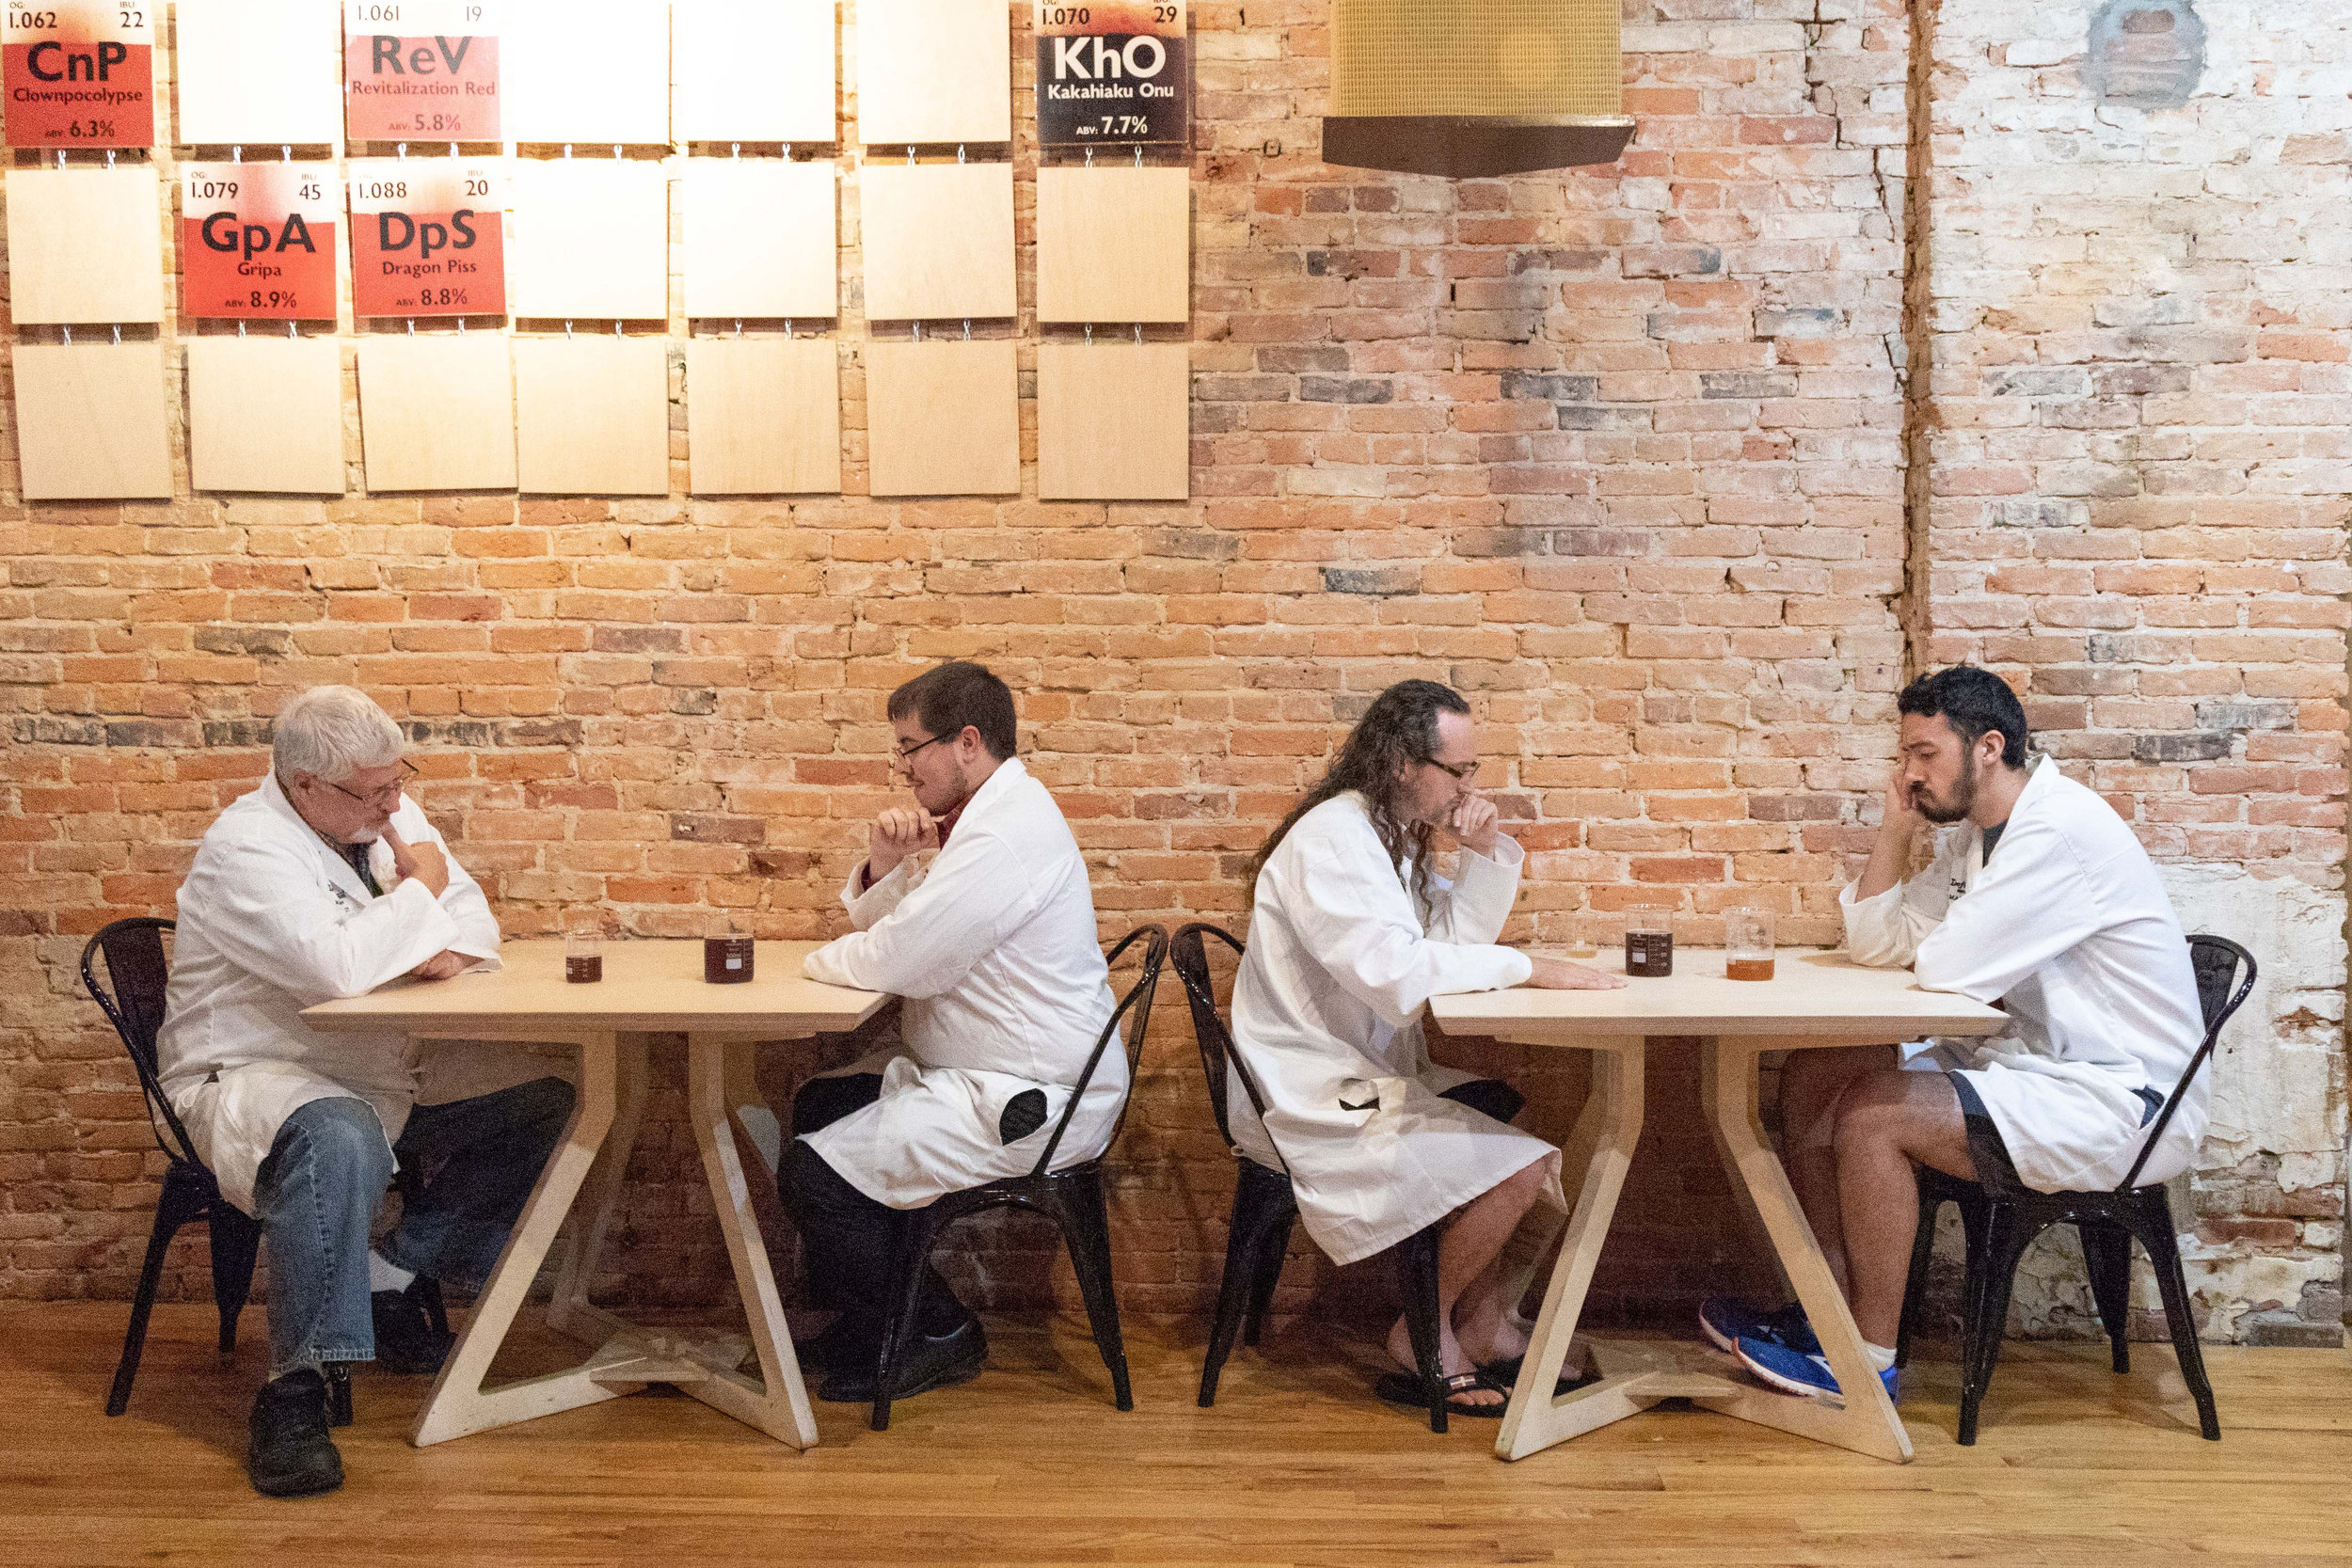 - Exferimentation Brewing Tables